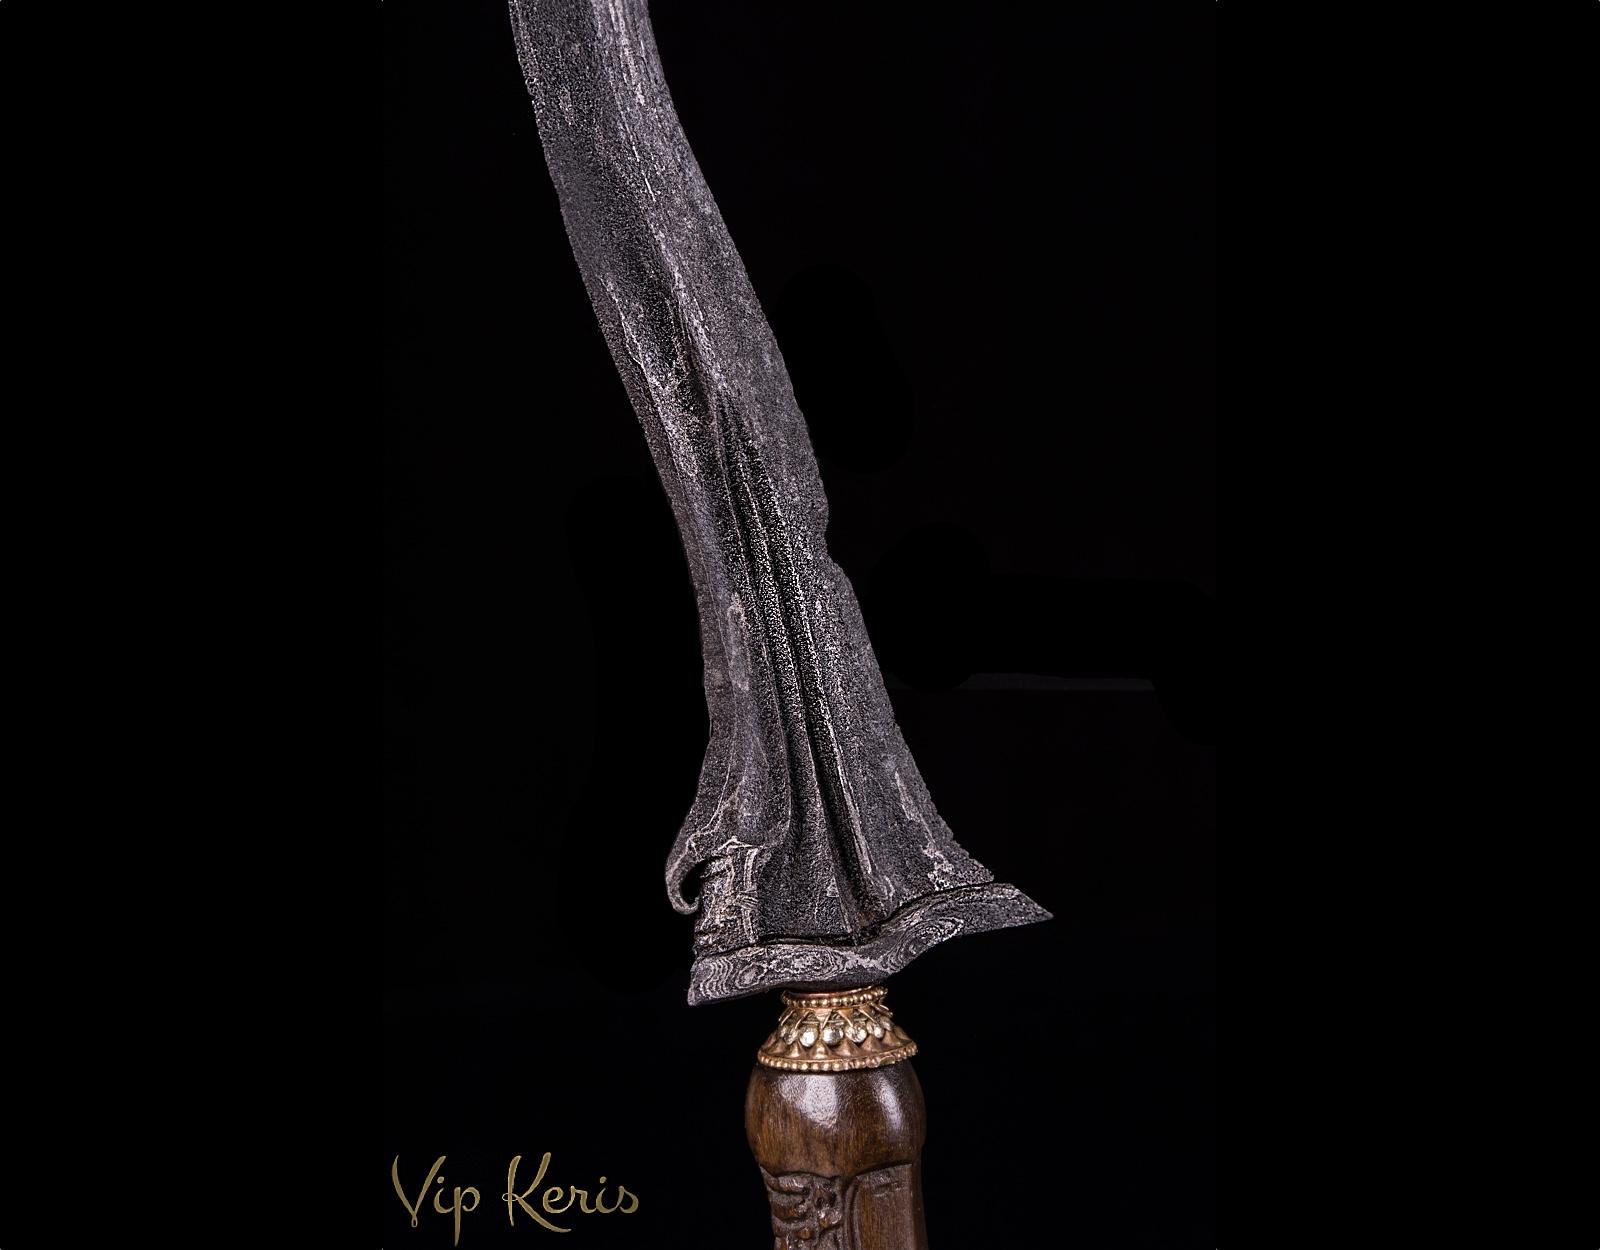 Нож Крис Balebang, боевая магия. фото VipKeris